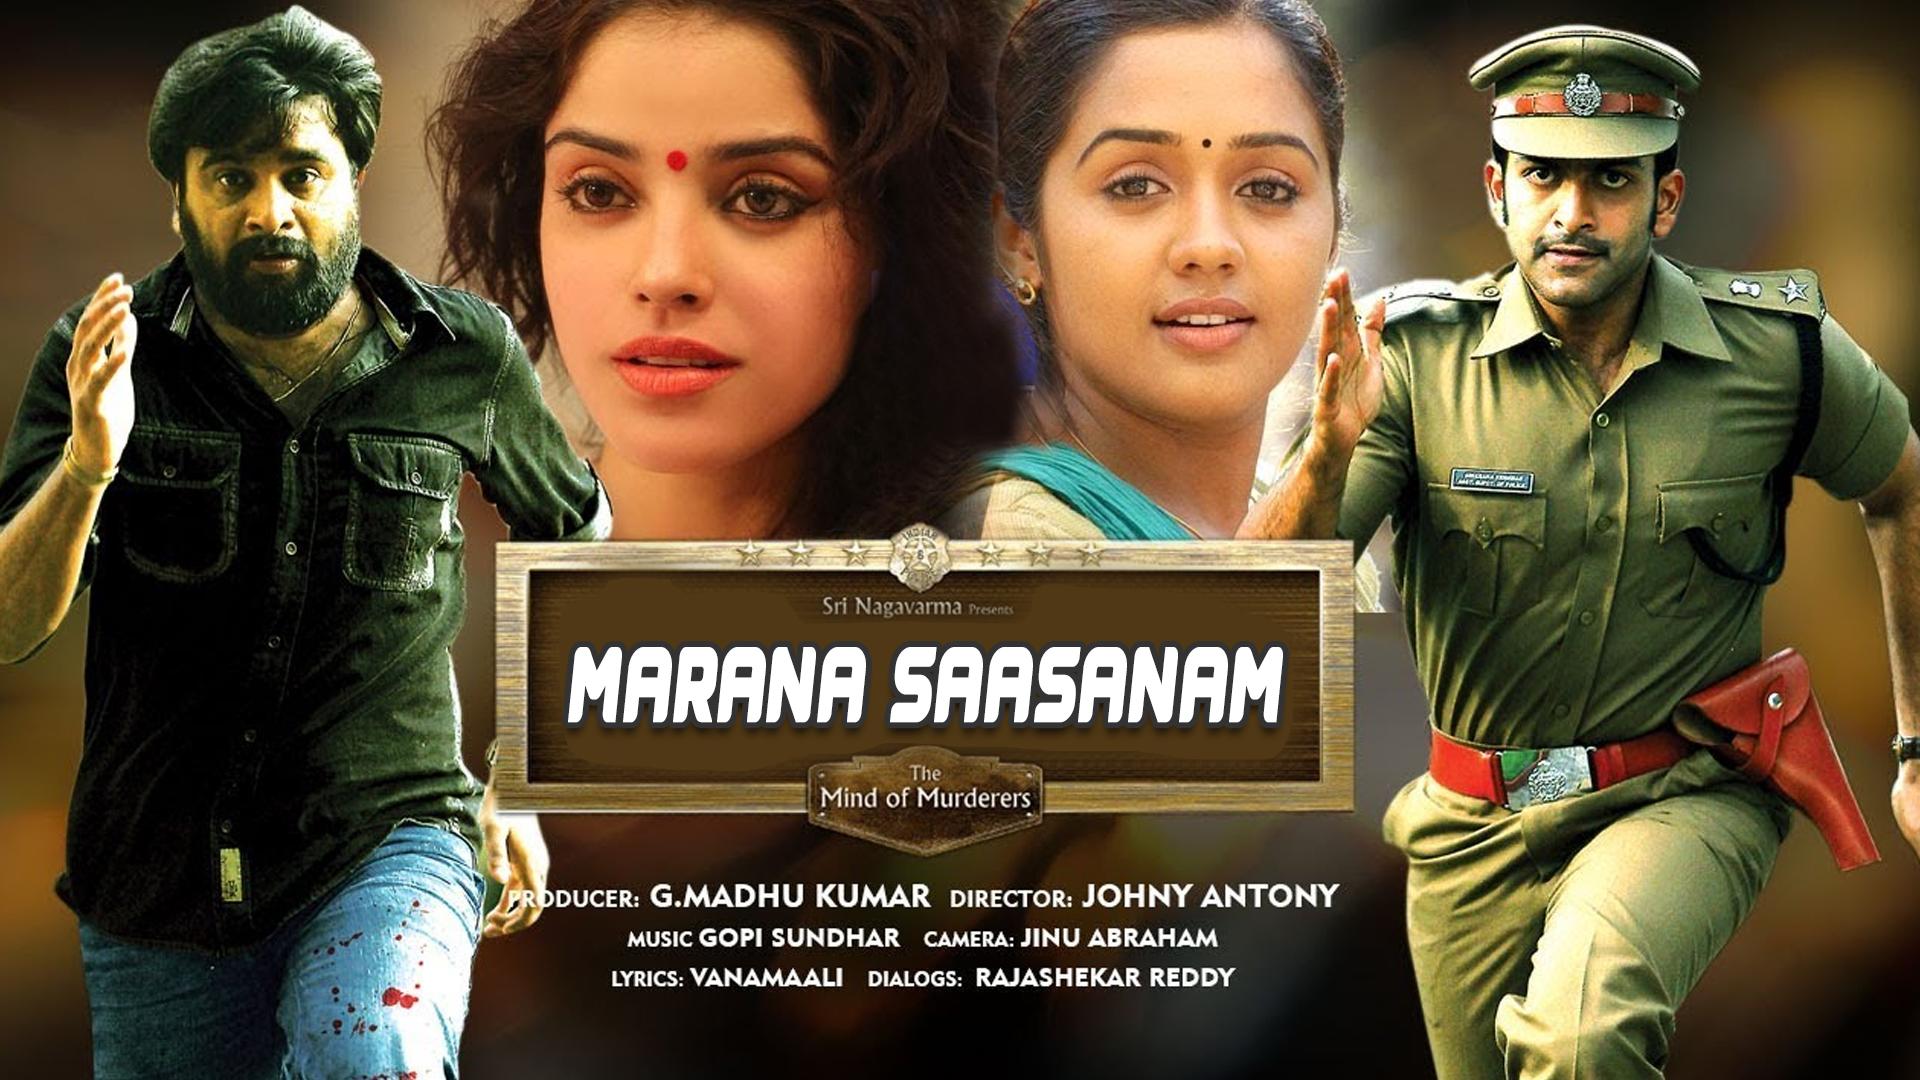 Marana Sasanam